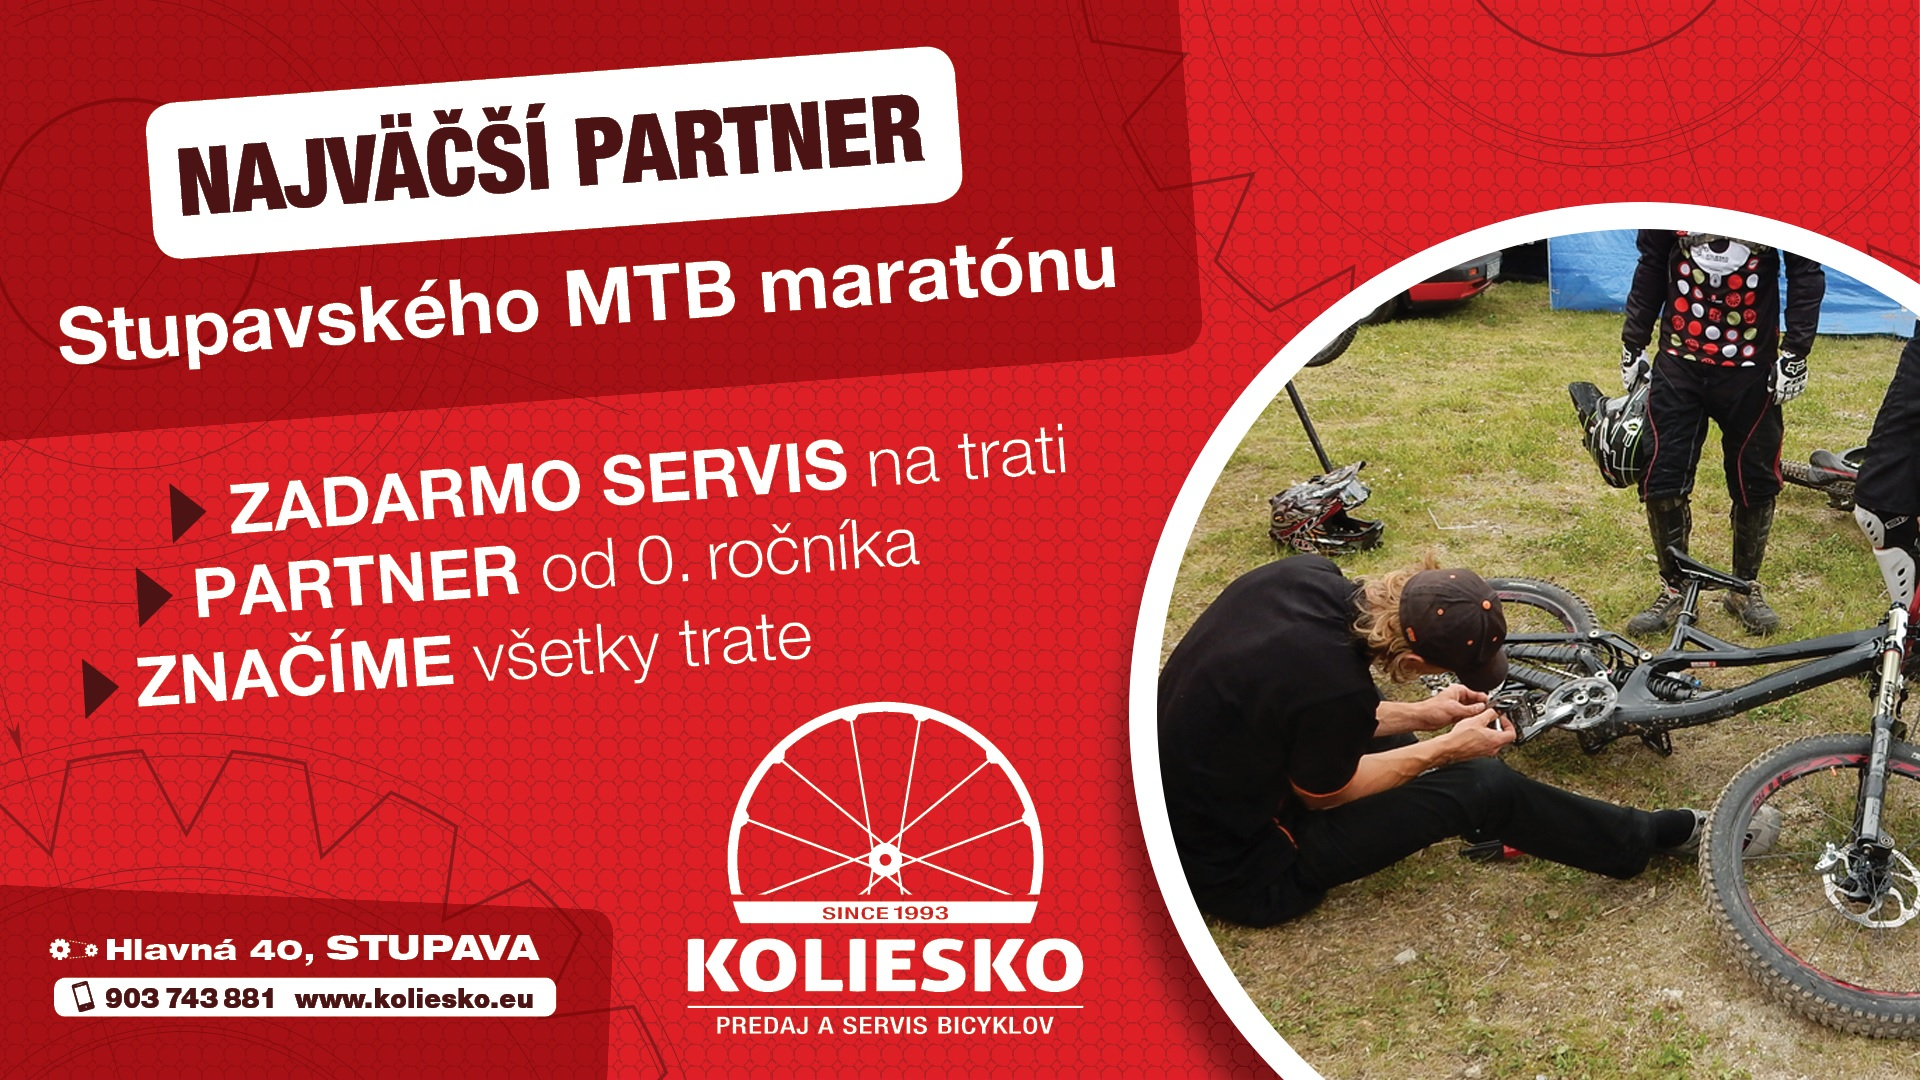 Sme hlavný partner Stupavského MTB maratónu